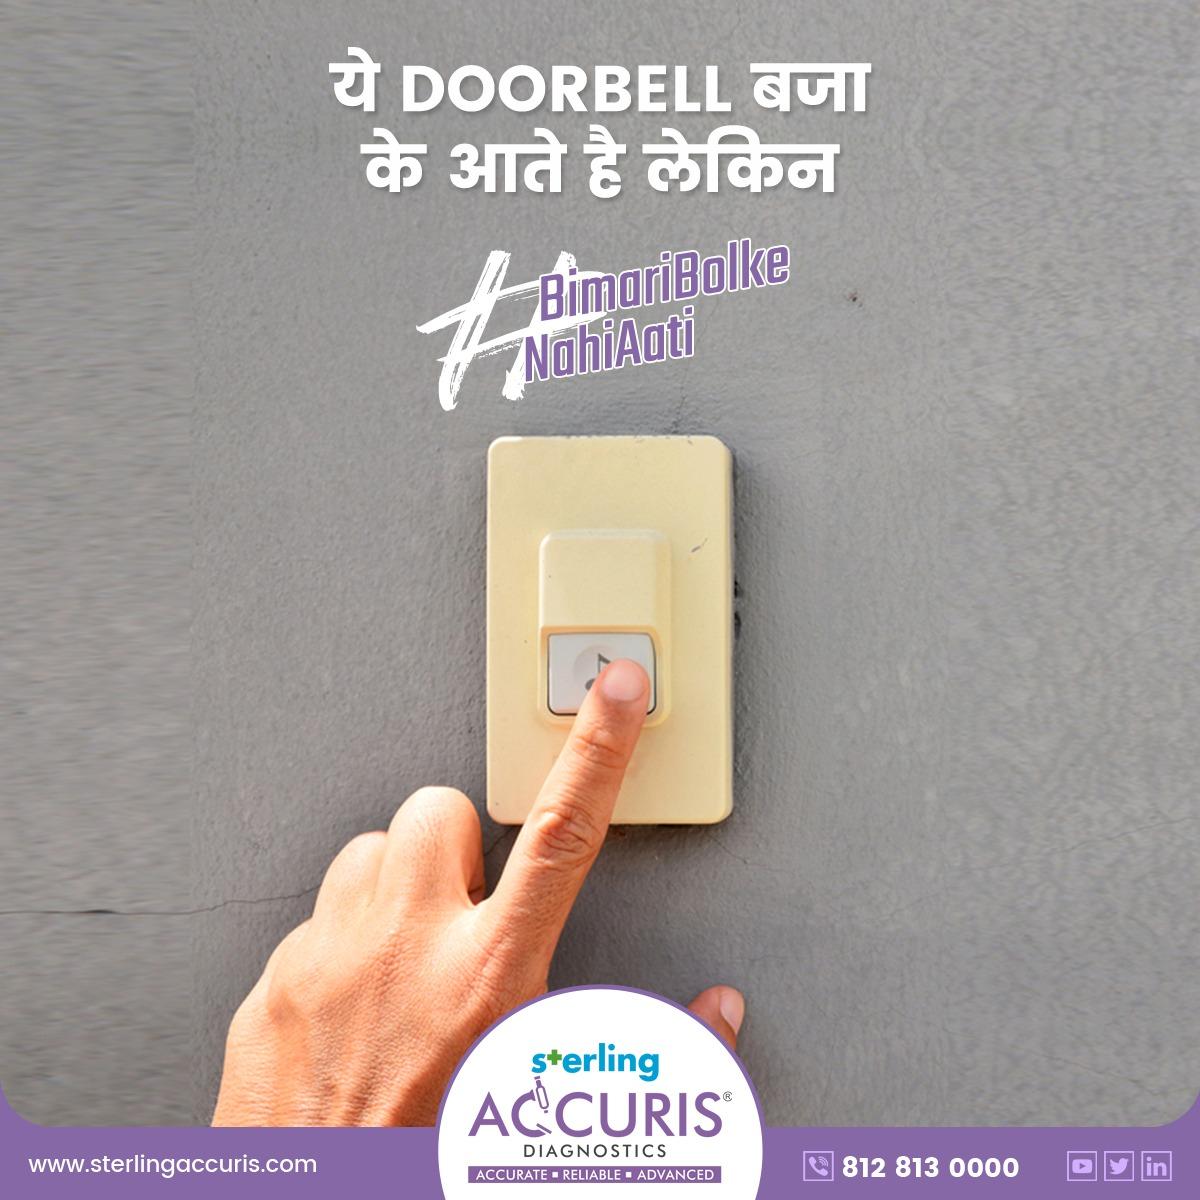 बीमारी कभी doorbell नहीं बजाती |   वो सीधे अंदर आ जाती है |  #bimaribolkenahiaati #pathlab #healthcheckup #pathlab #health #healthandwellness #gujarat #india #instahealth #instagood #ahemdabad #healthcare #pathologistspic.twitter.com/IQ30gRvLOl